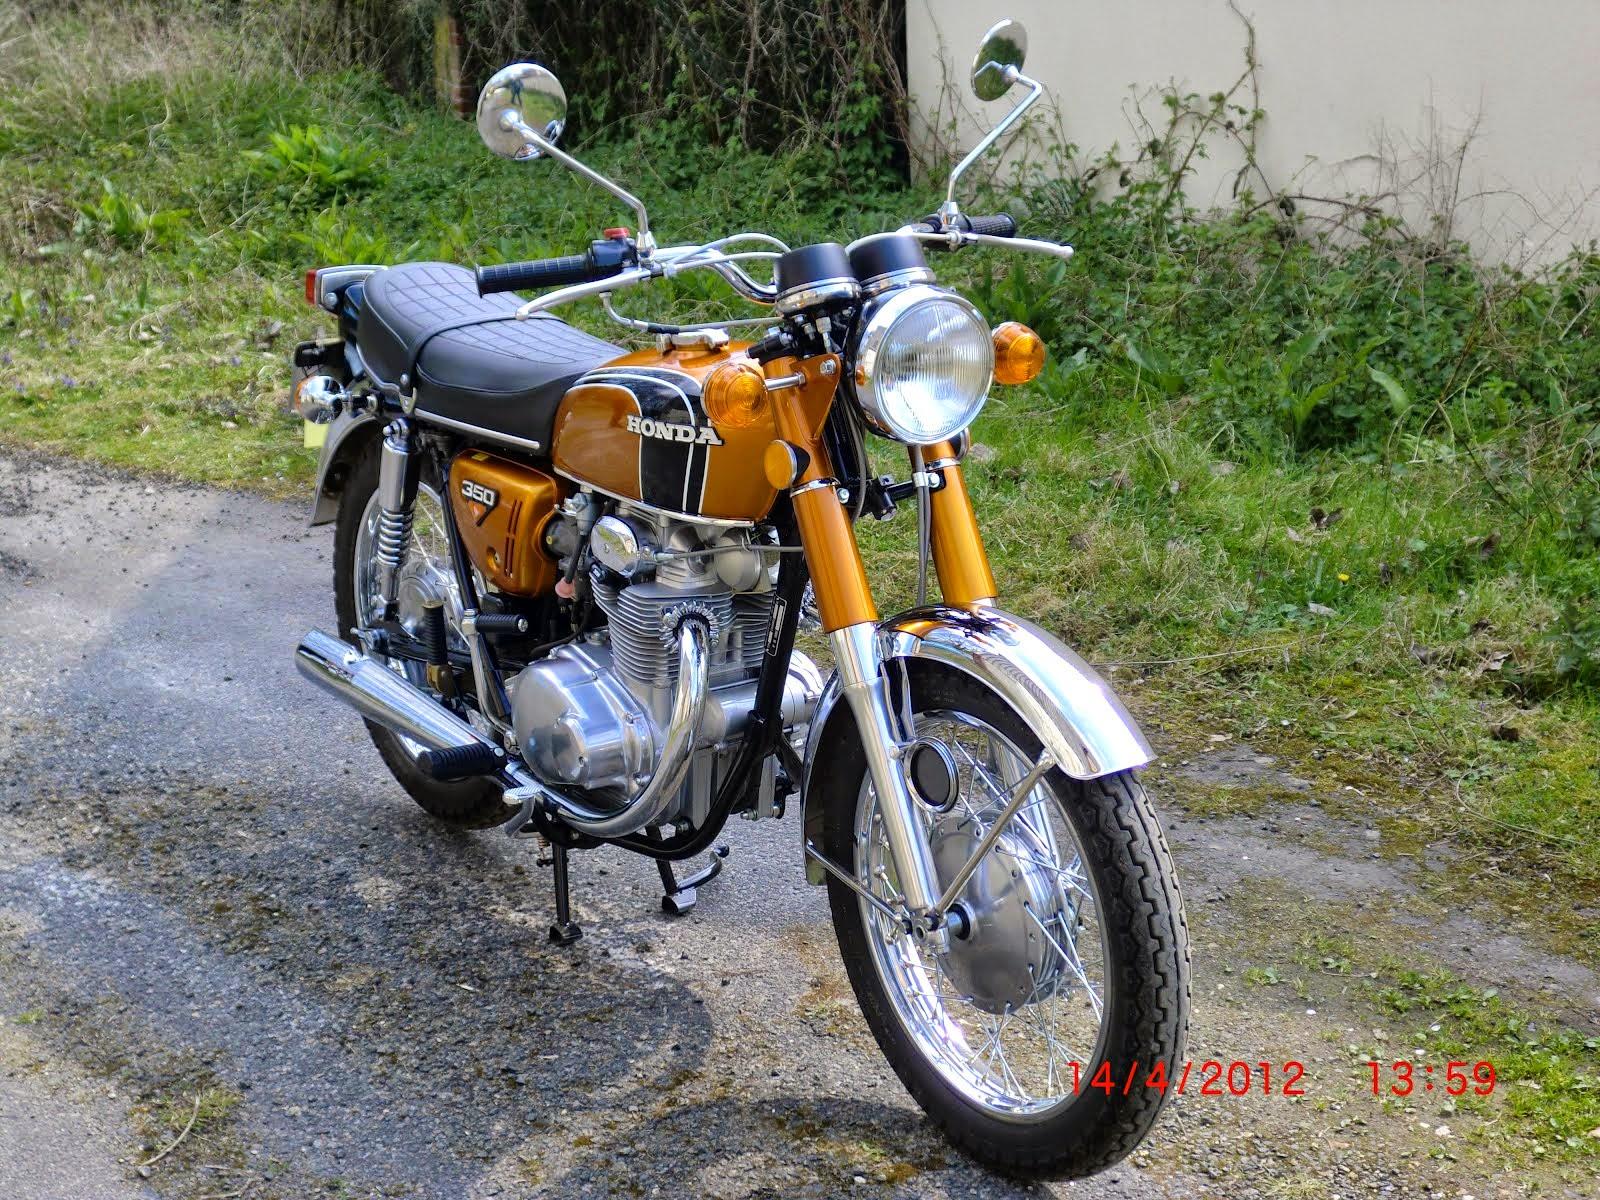 Honda-Tiger-Modifikasi-Cb-modifikasi-honda-cb-100-terbaru-1789 ...